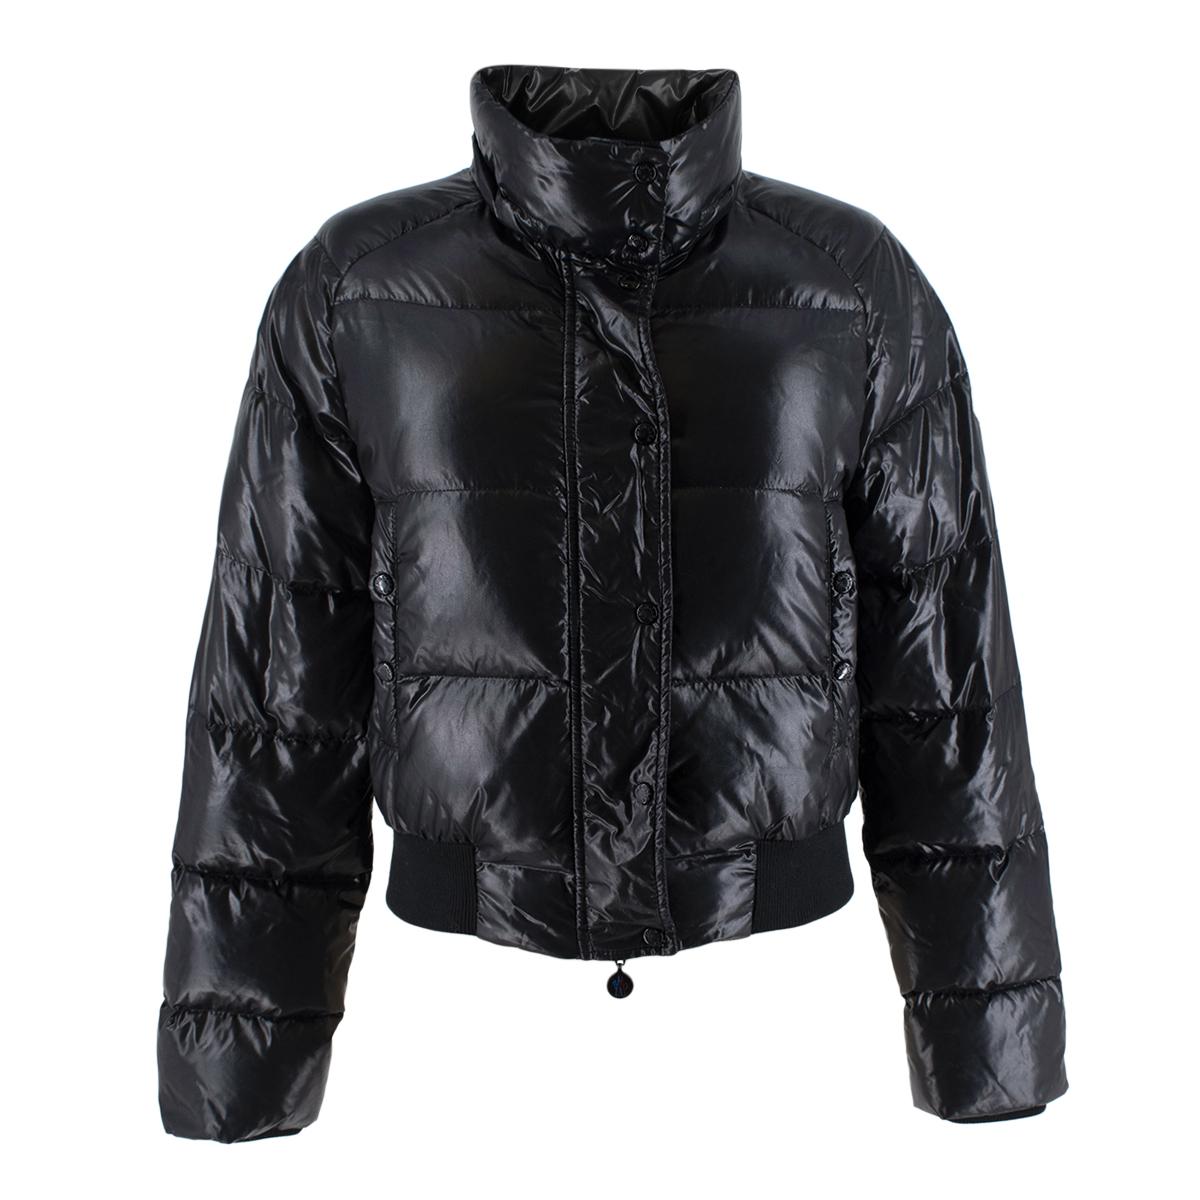 Moncler Black Padded Puffer Jacket